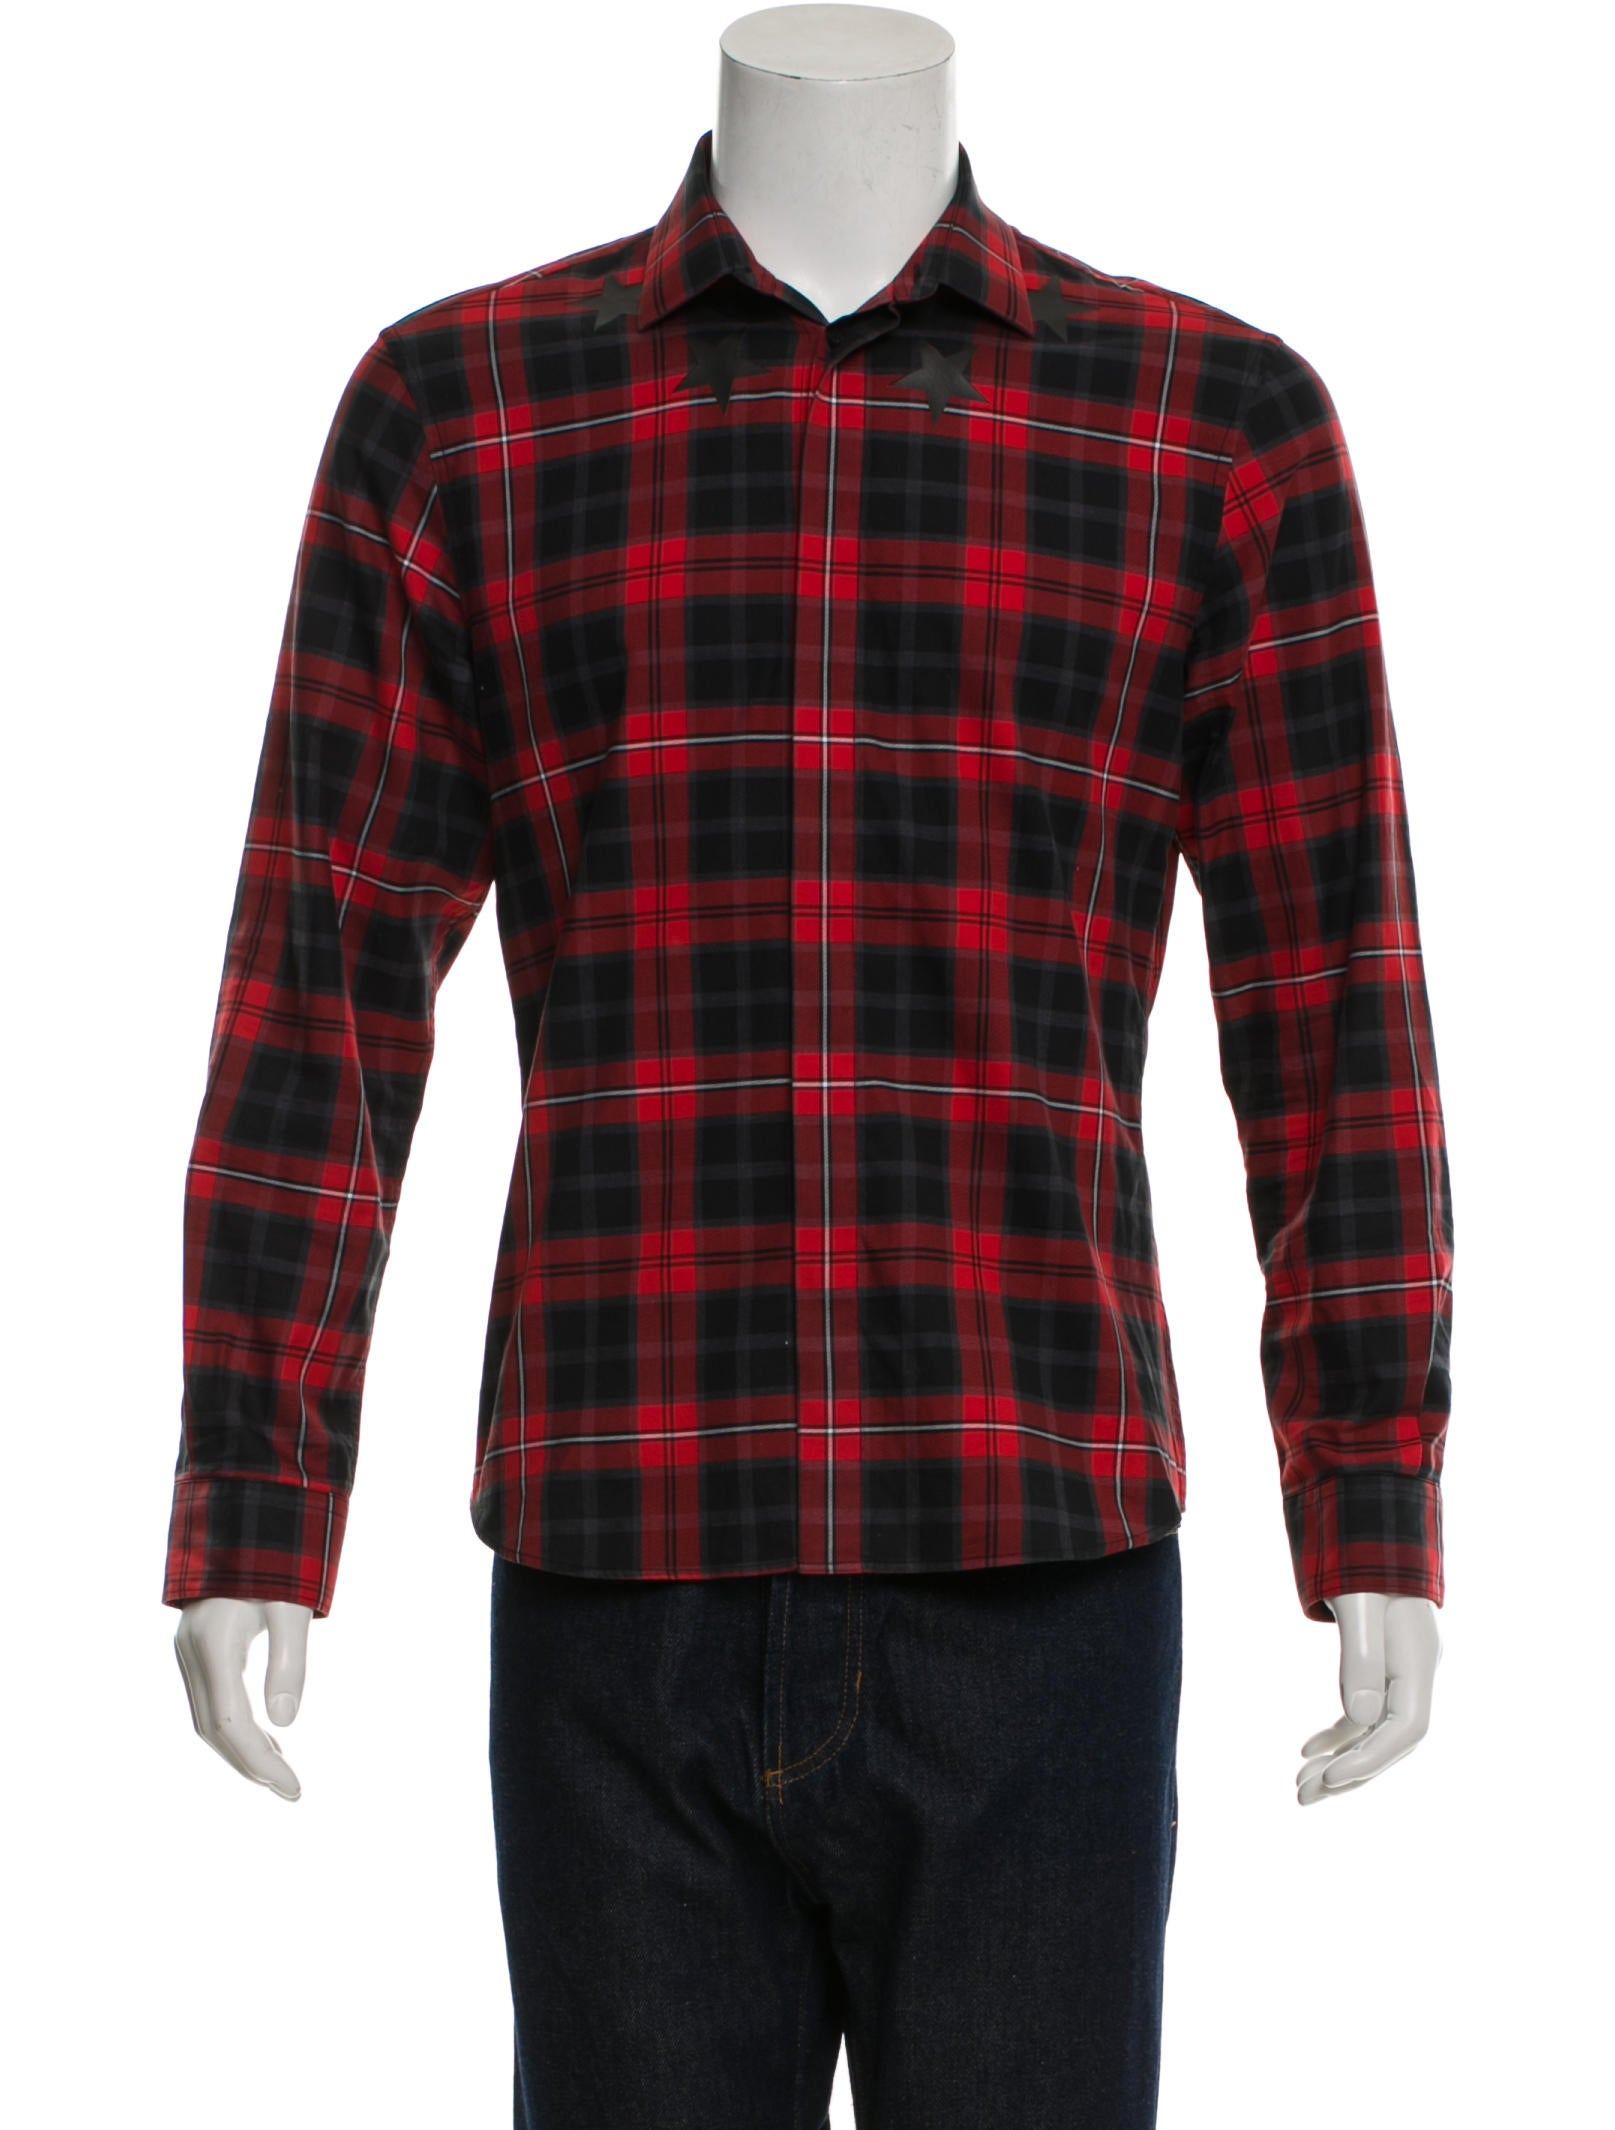 3e7a6d99035a Givenchy Plaid Star Button-Up Shirt - Clothing - GIV28825